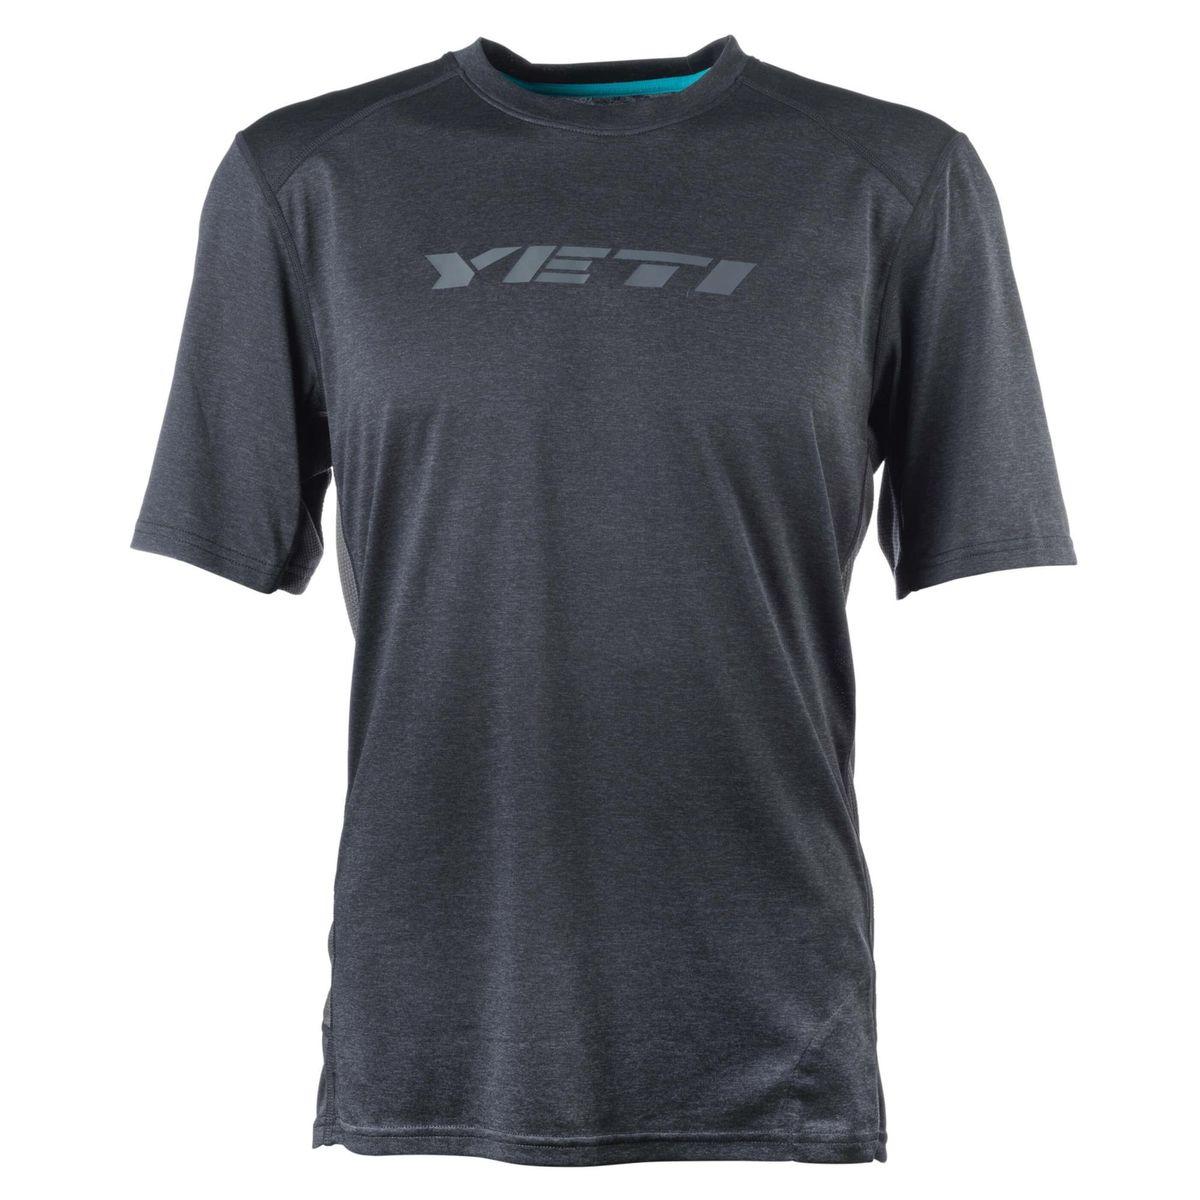 2017 YETI TOLLAND TOLLAND YETI JERSEY KURZARM  > GO CYCLE SHOP 429d95